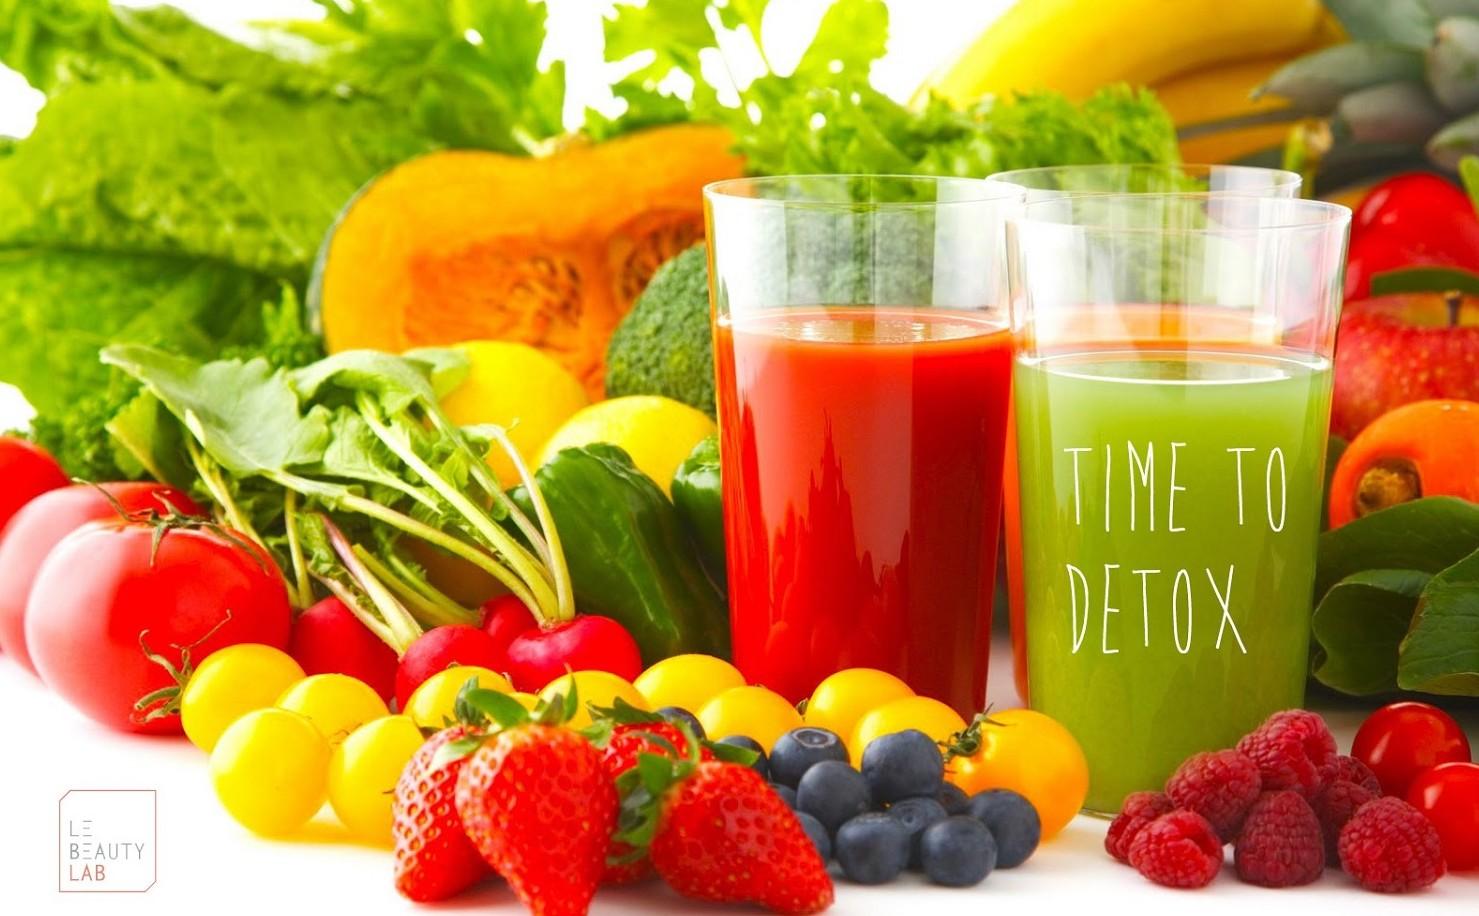 Dieta in base ad esigenze personali, dif